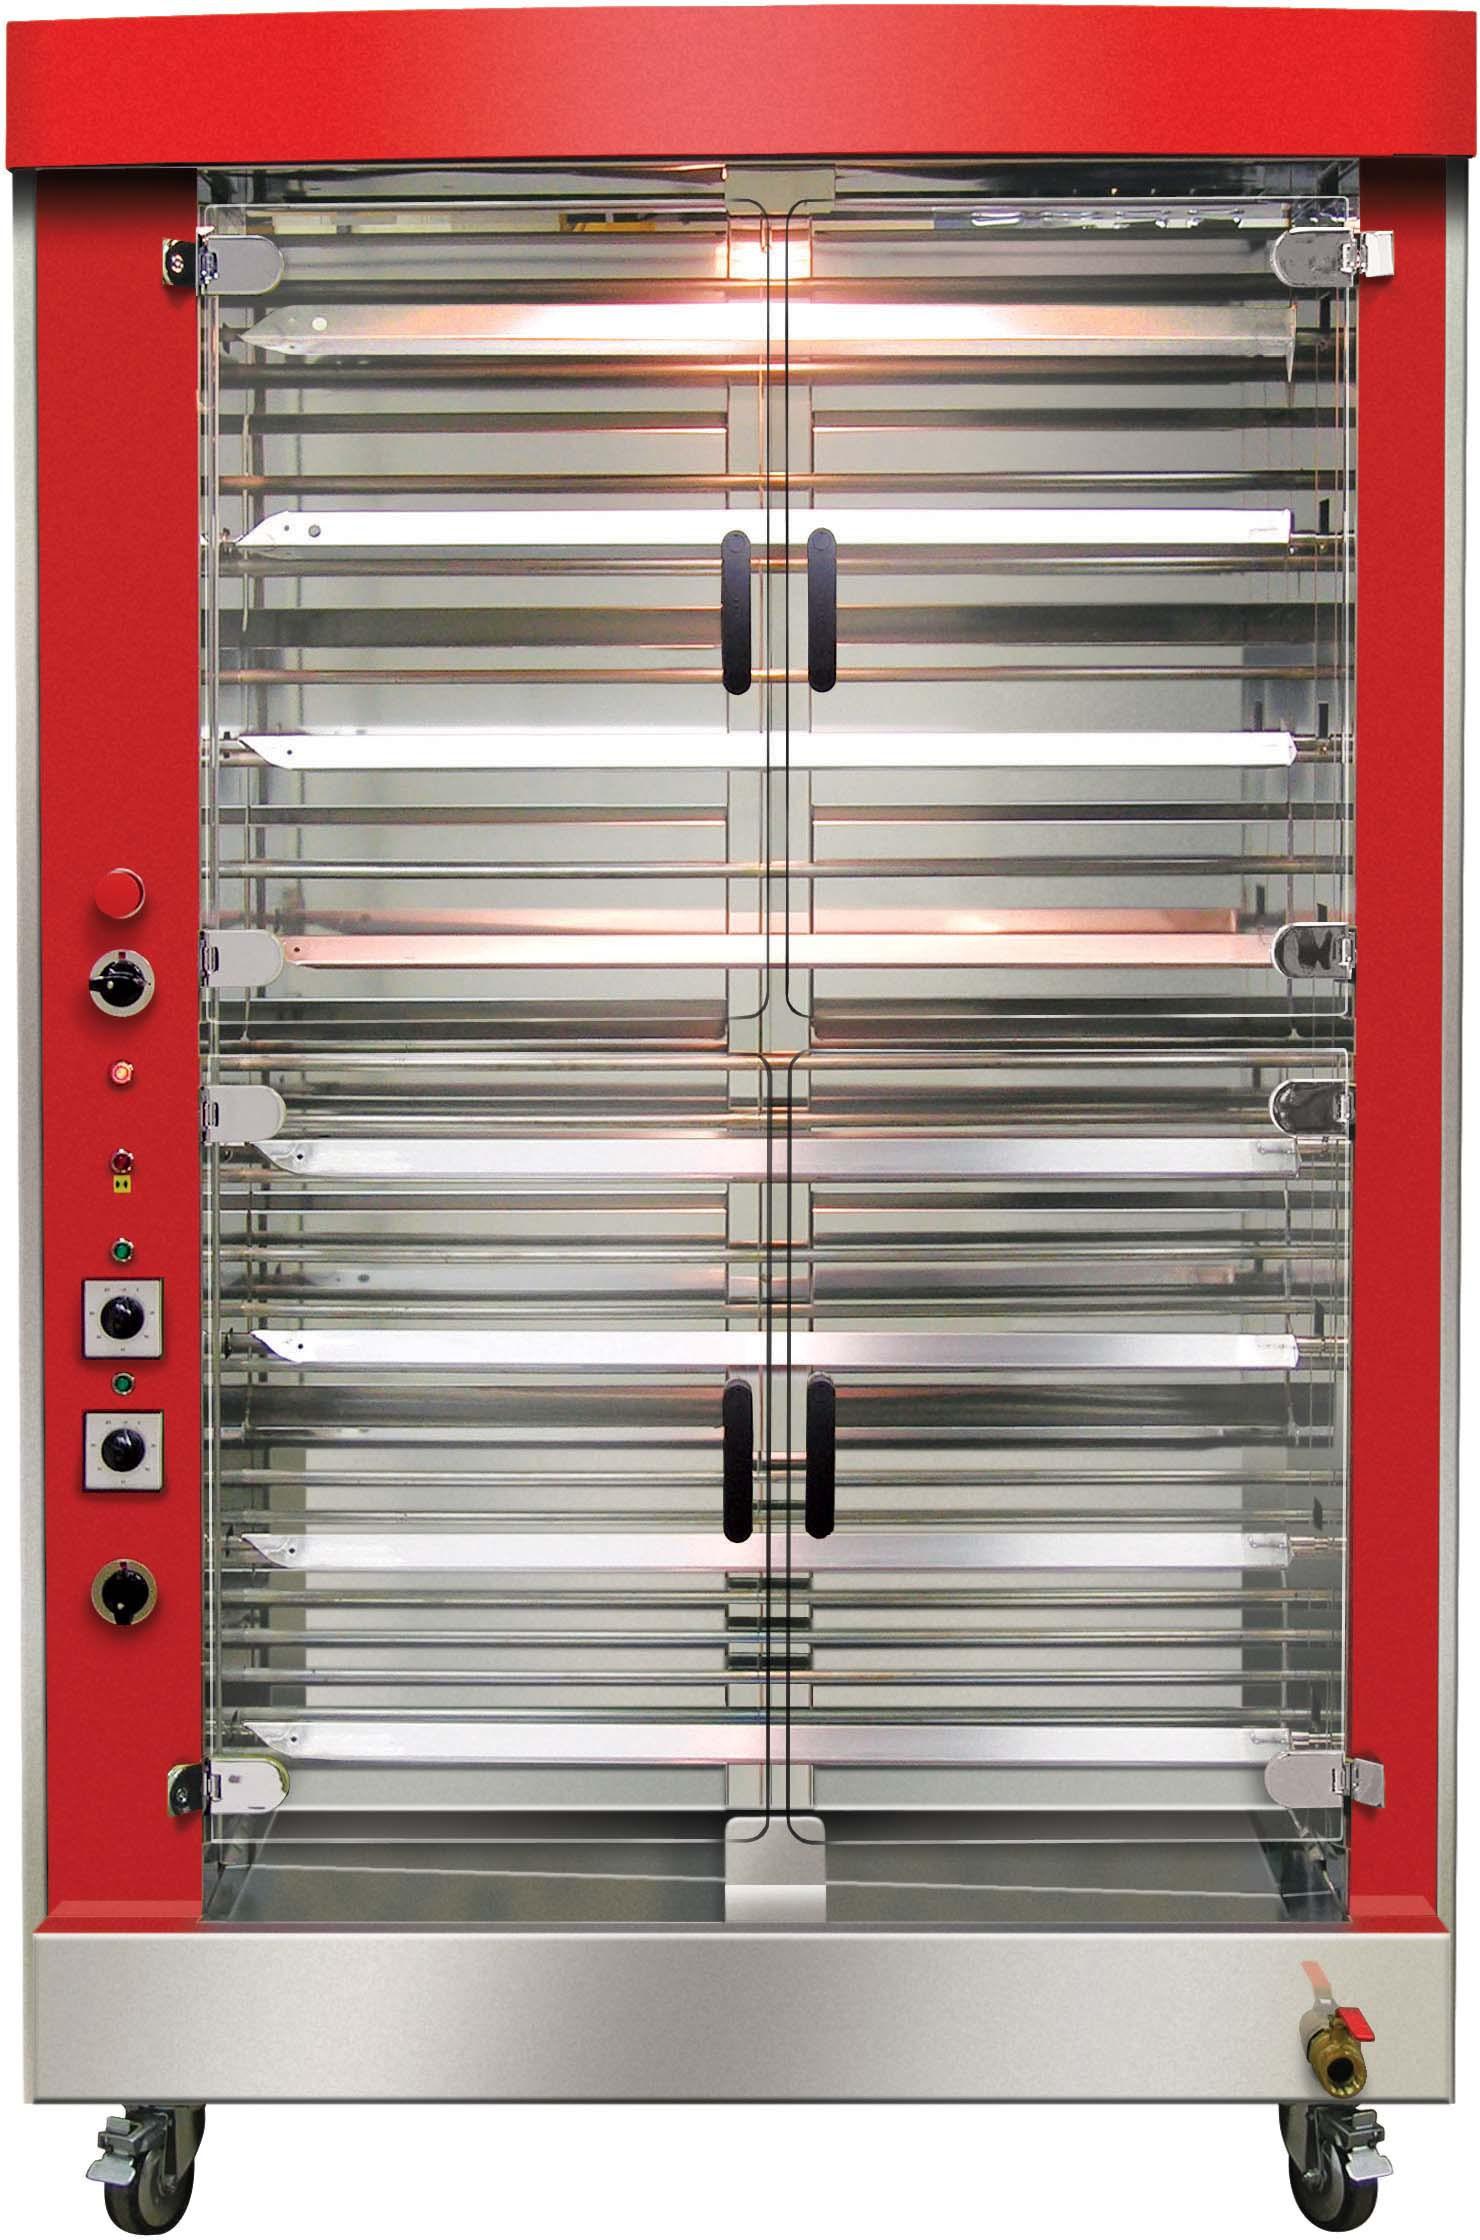 Rotisserie Concepts - Rotisol - Performance 1320.6 radiant